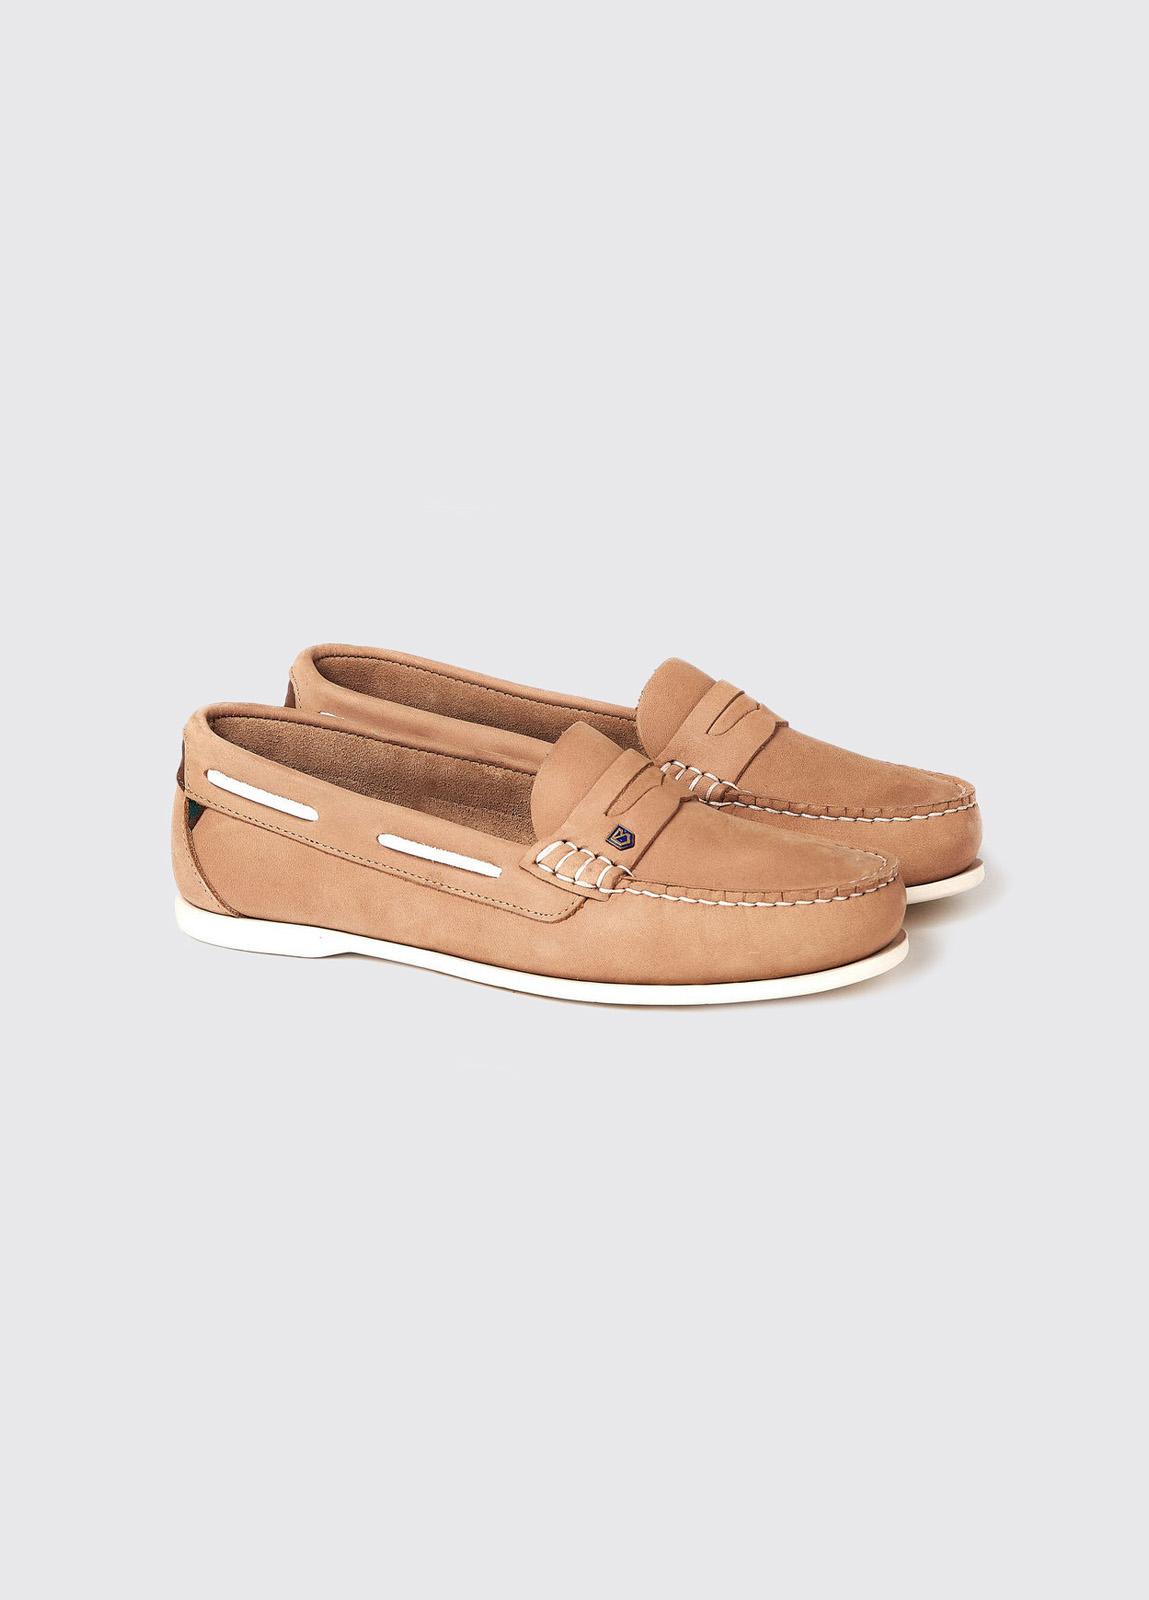 Belize Deck Shoe - Beige